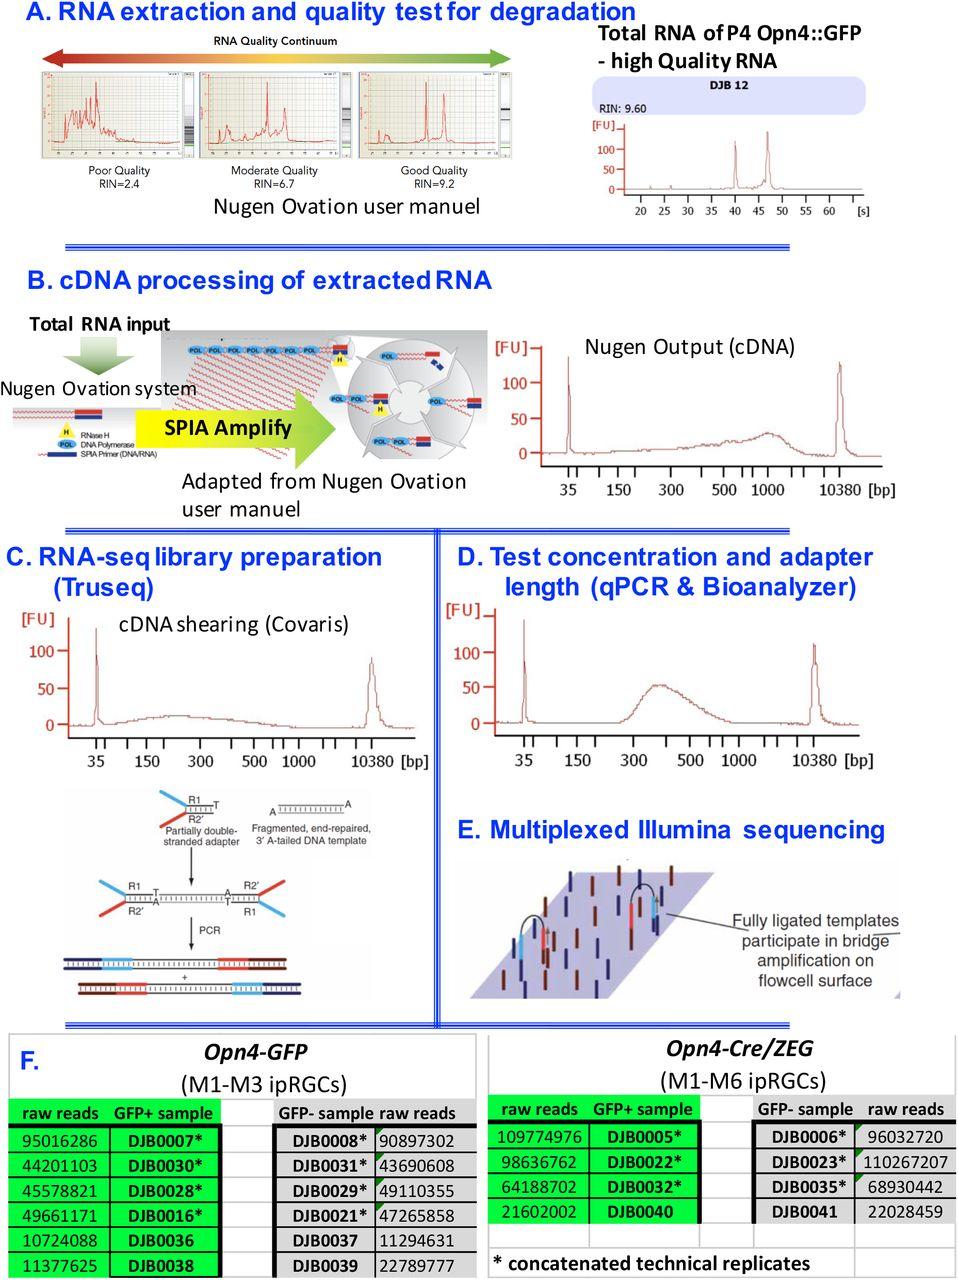 Molecular Diversity of Intrinsically Photosensitive Ganglion Cells